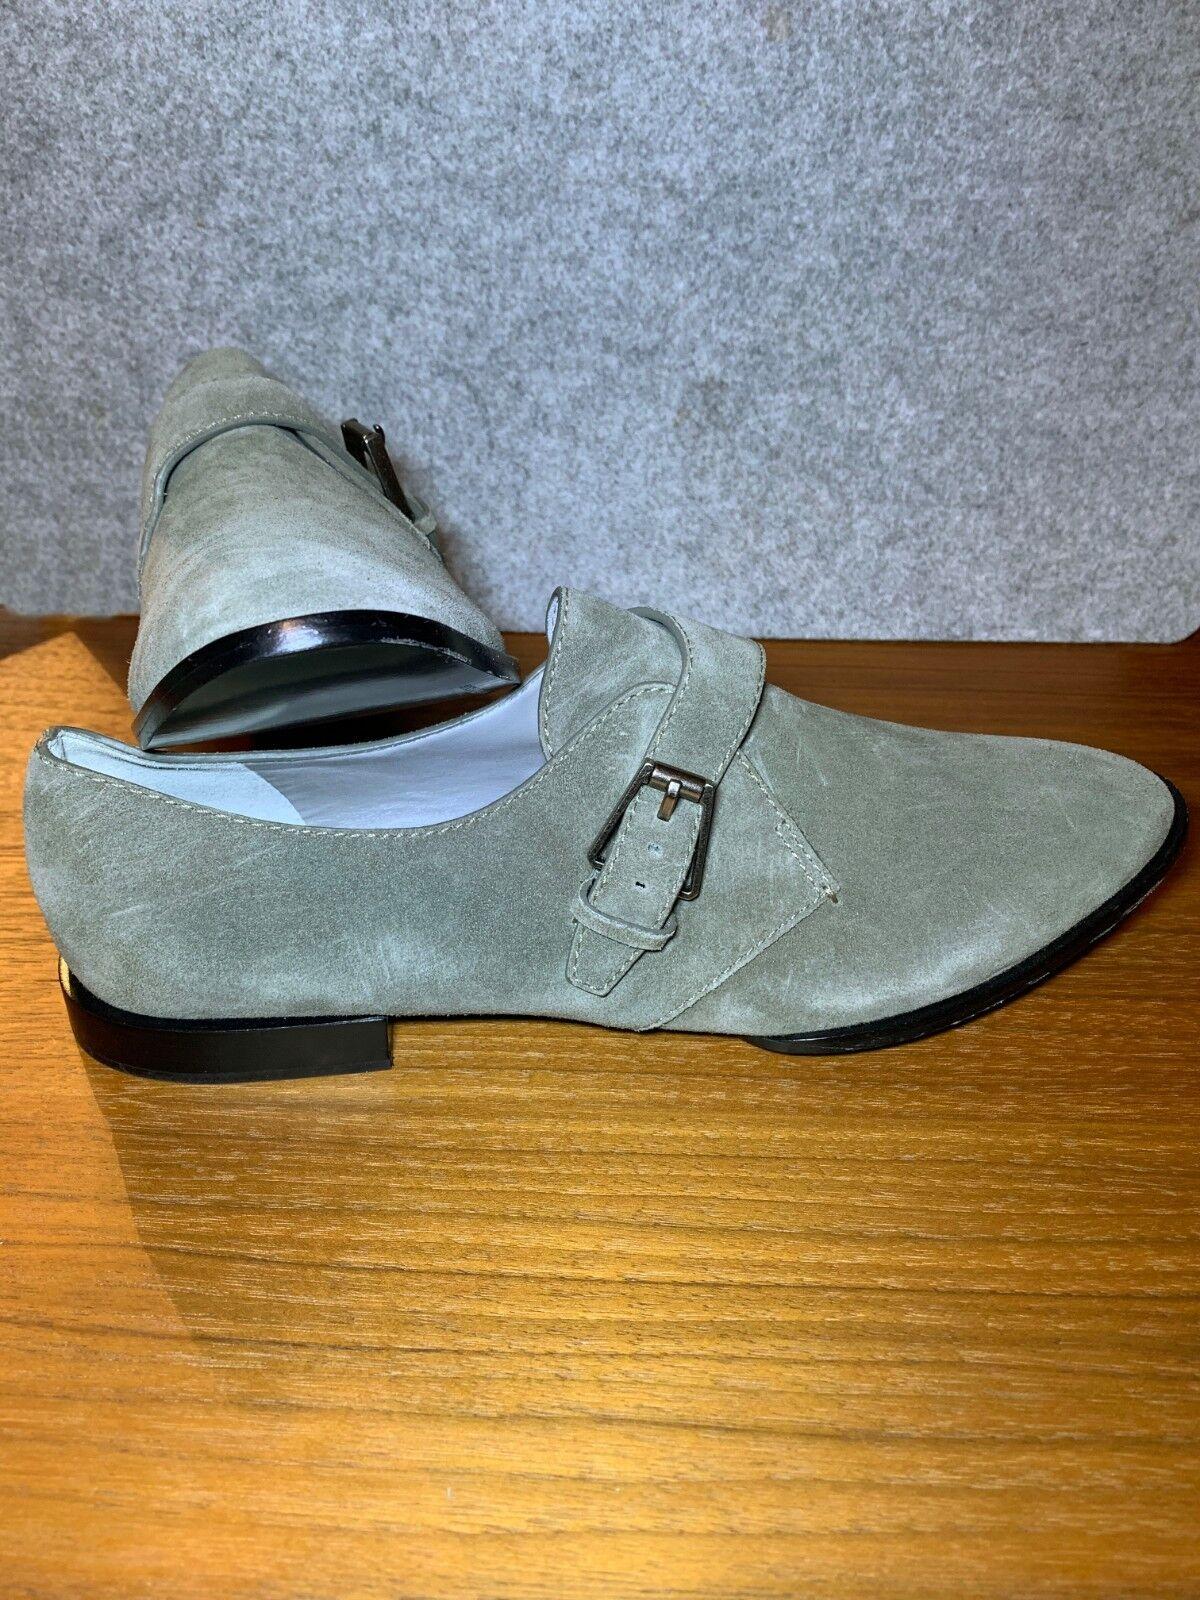 b9af072ed76 ALEXANDER WANG Monk Strap Oxfords shoes Suede Grey Size Size Size US 11 EU  41 063320 ...